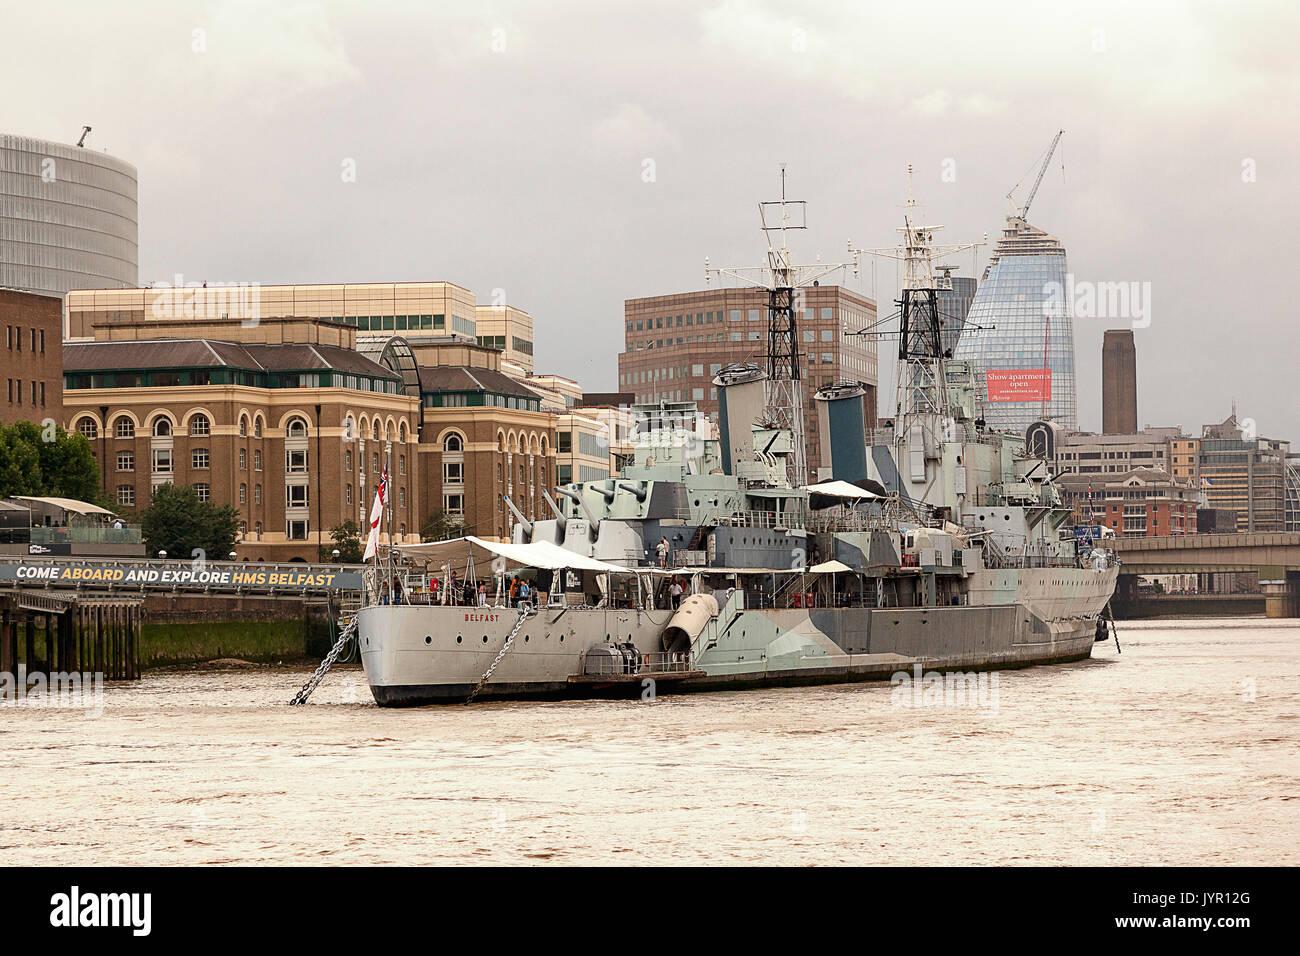 HMS Belfast, London, England - Stock Image